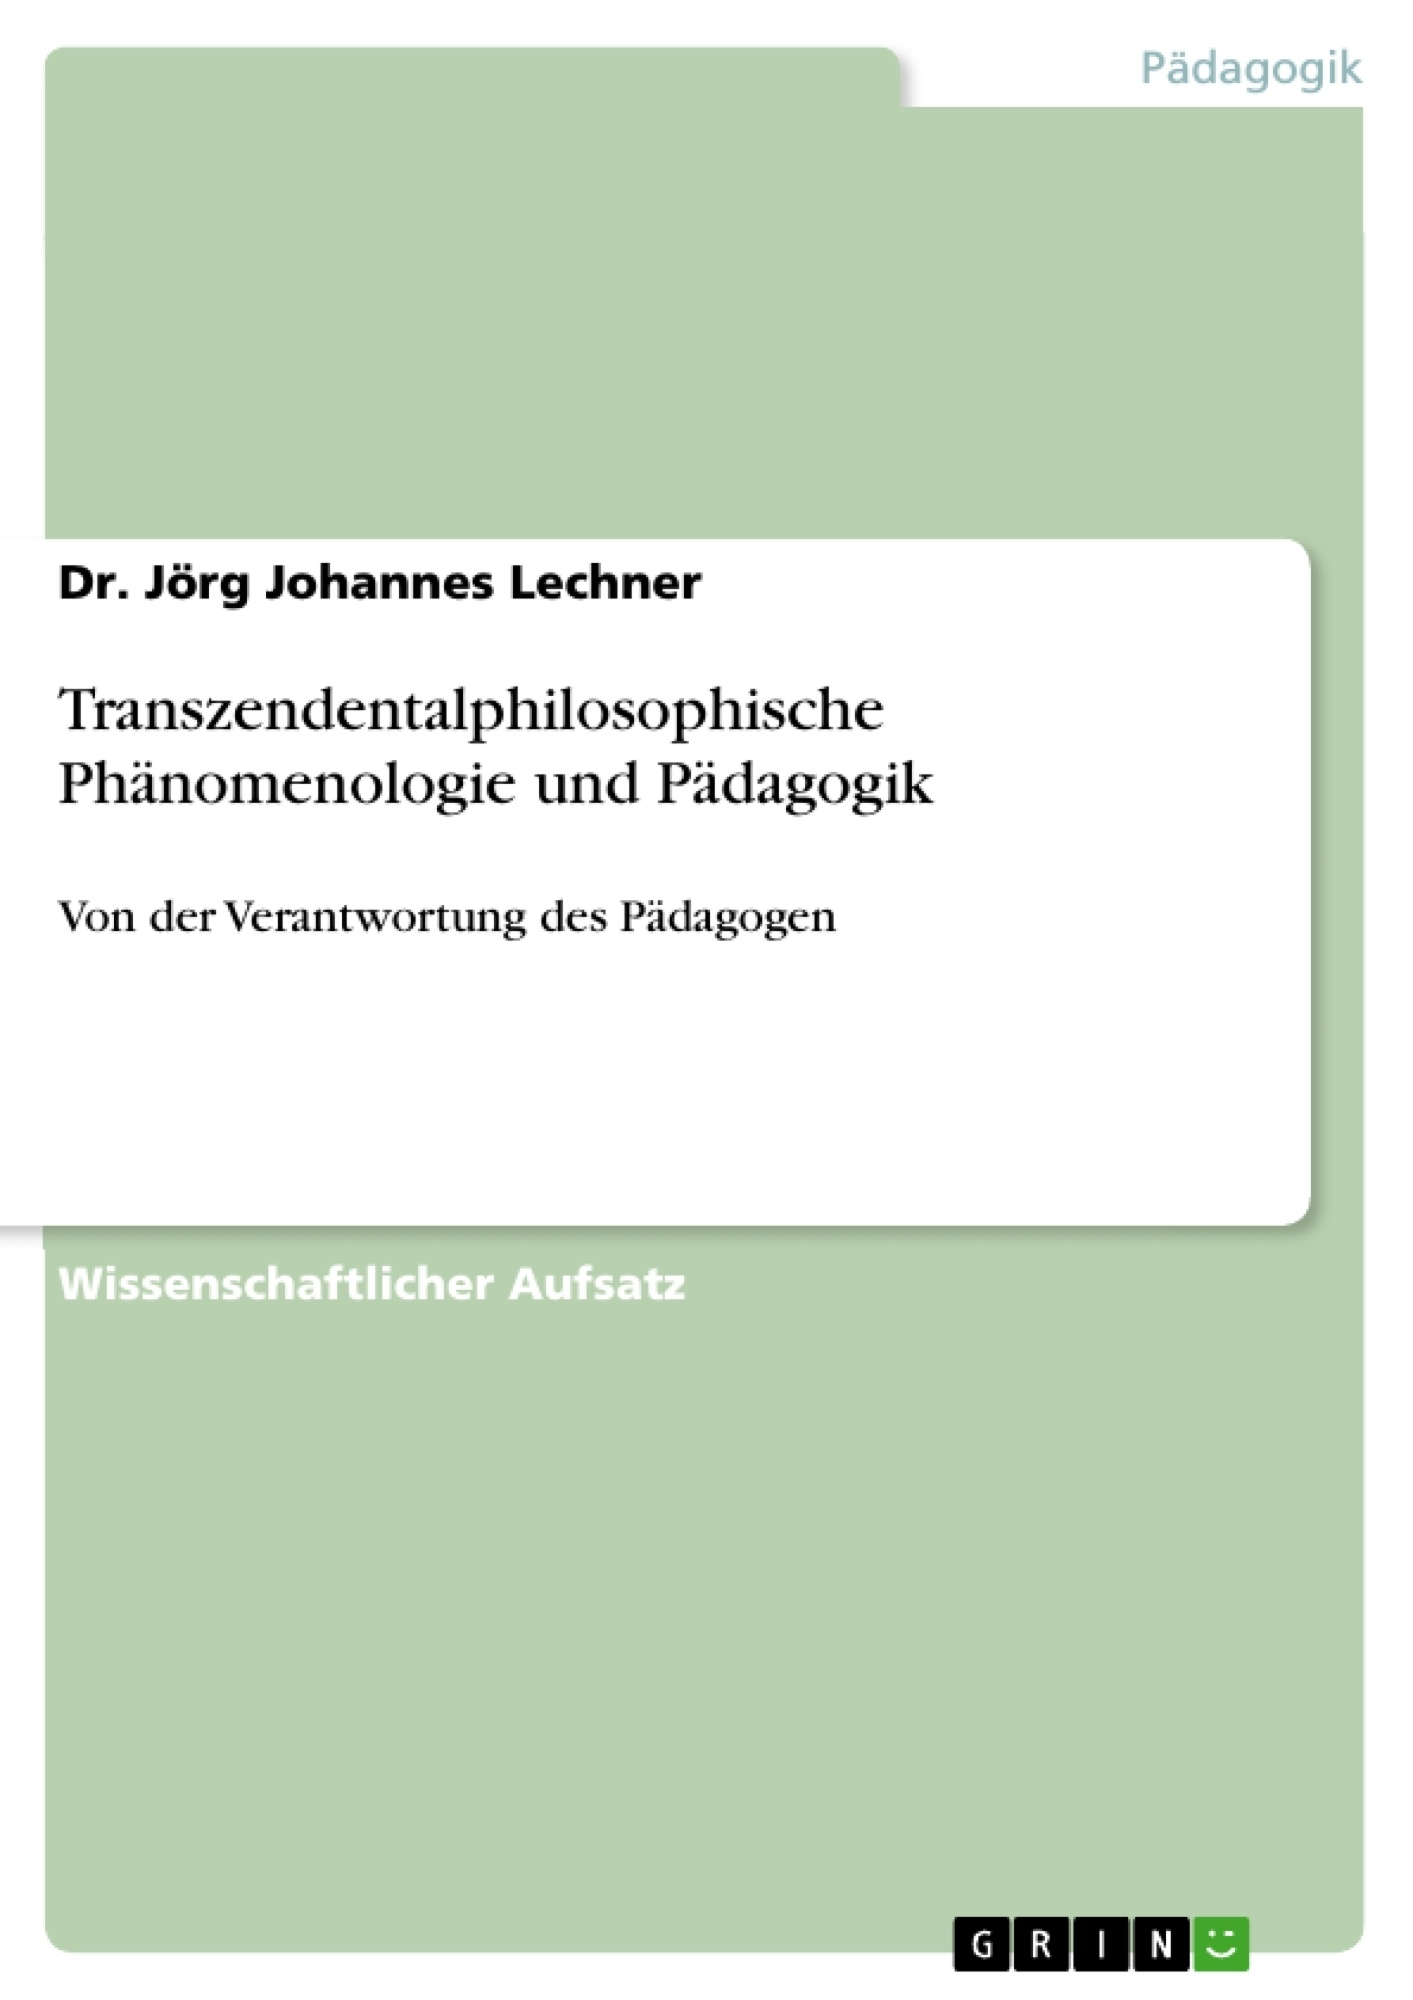 Titel: Transzendentalphilosophische Phänomenologie und Pädagogik